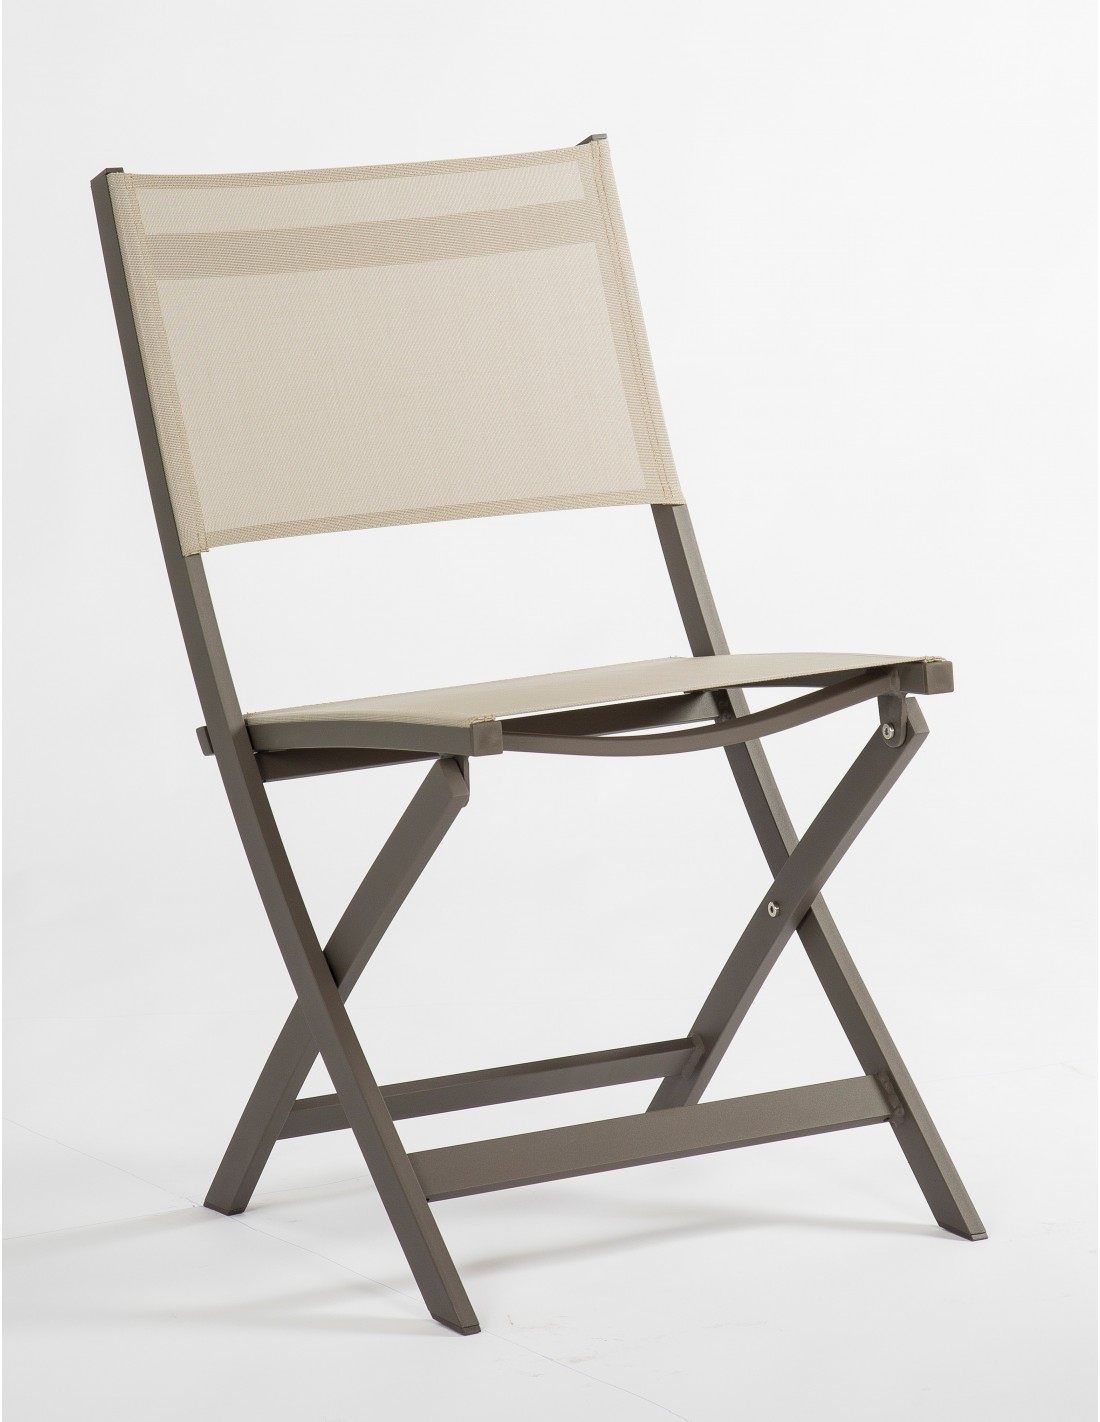 chaise pliante joe stern aluminium taupe assise textil ne cr me. Black Bedroom Furniture Sets. Home Design Ideas